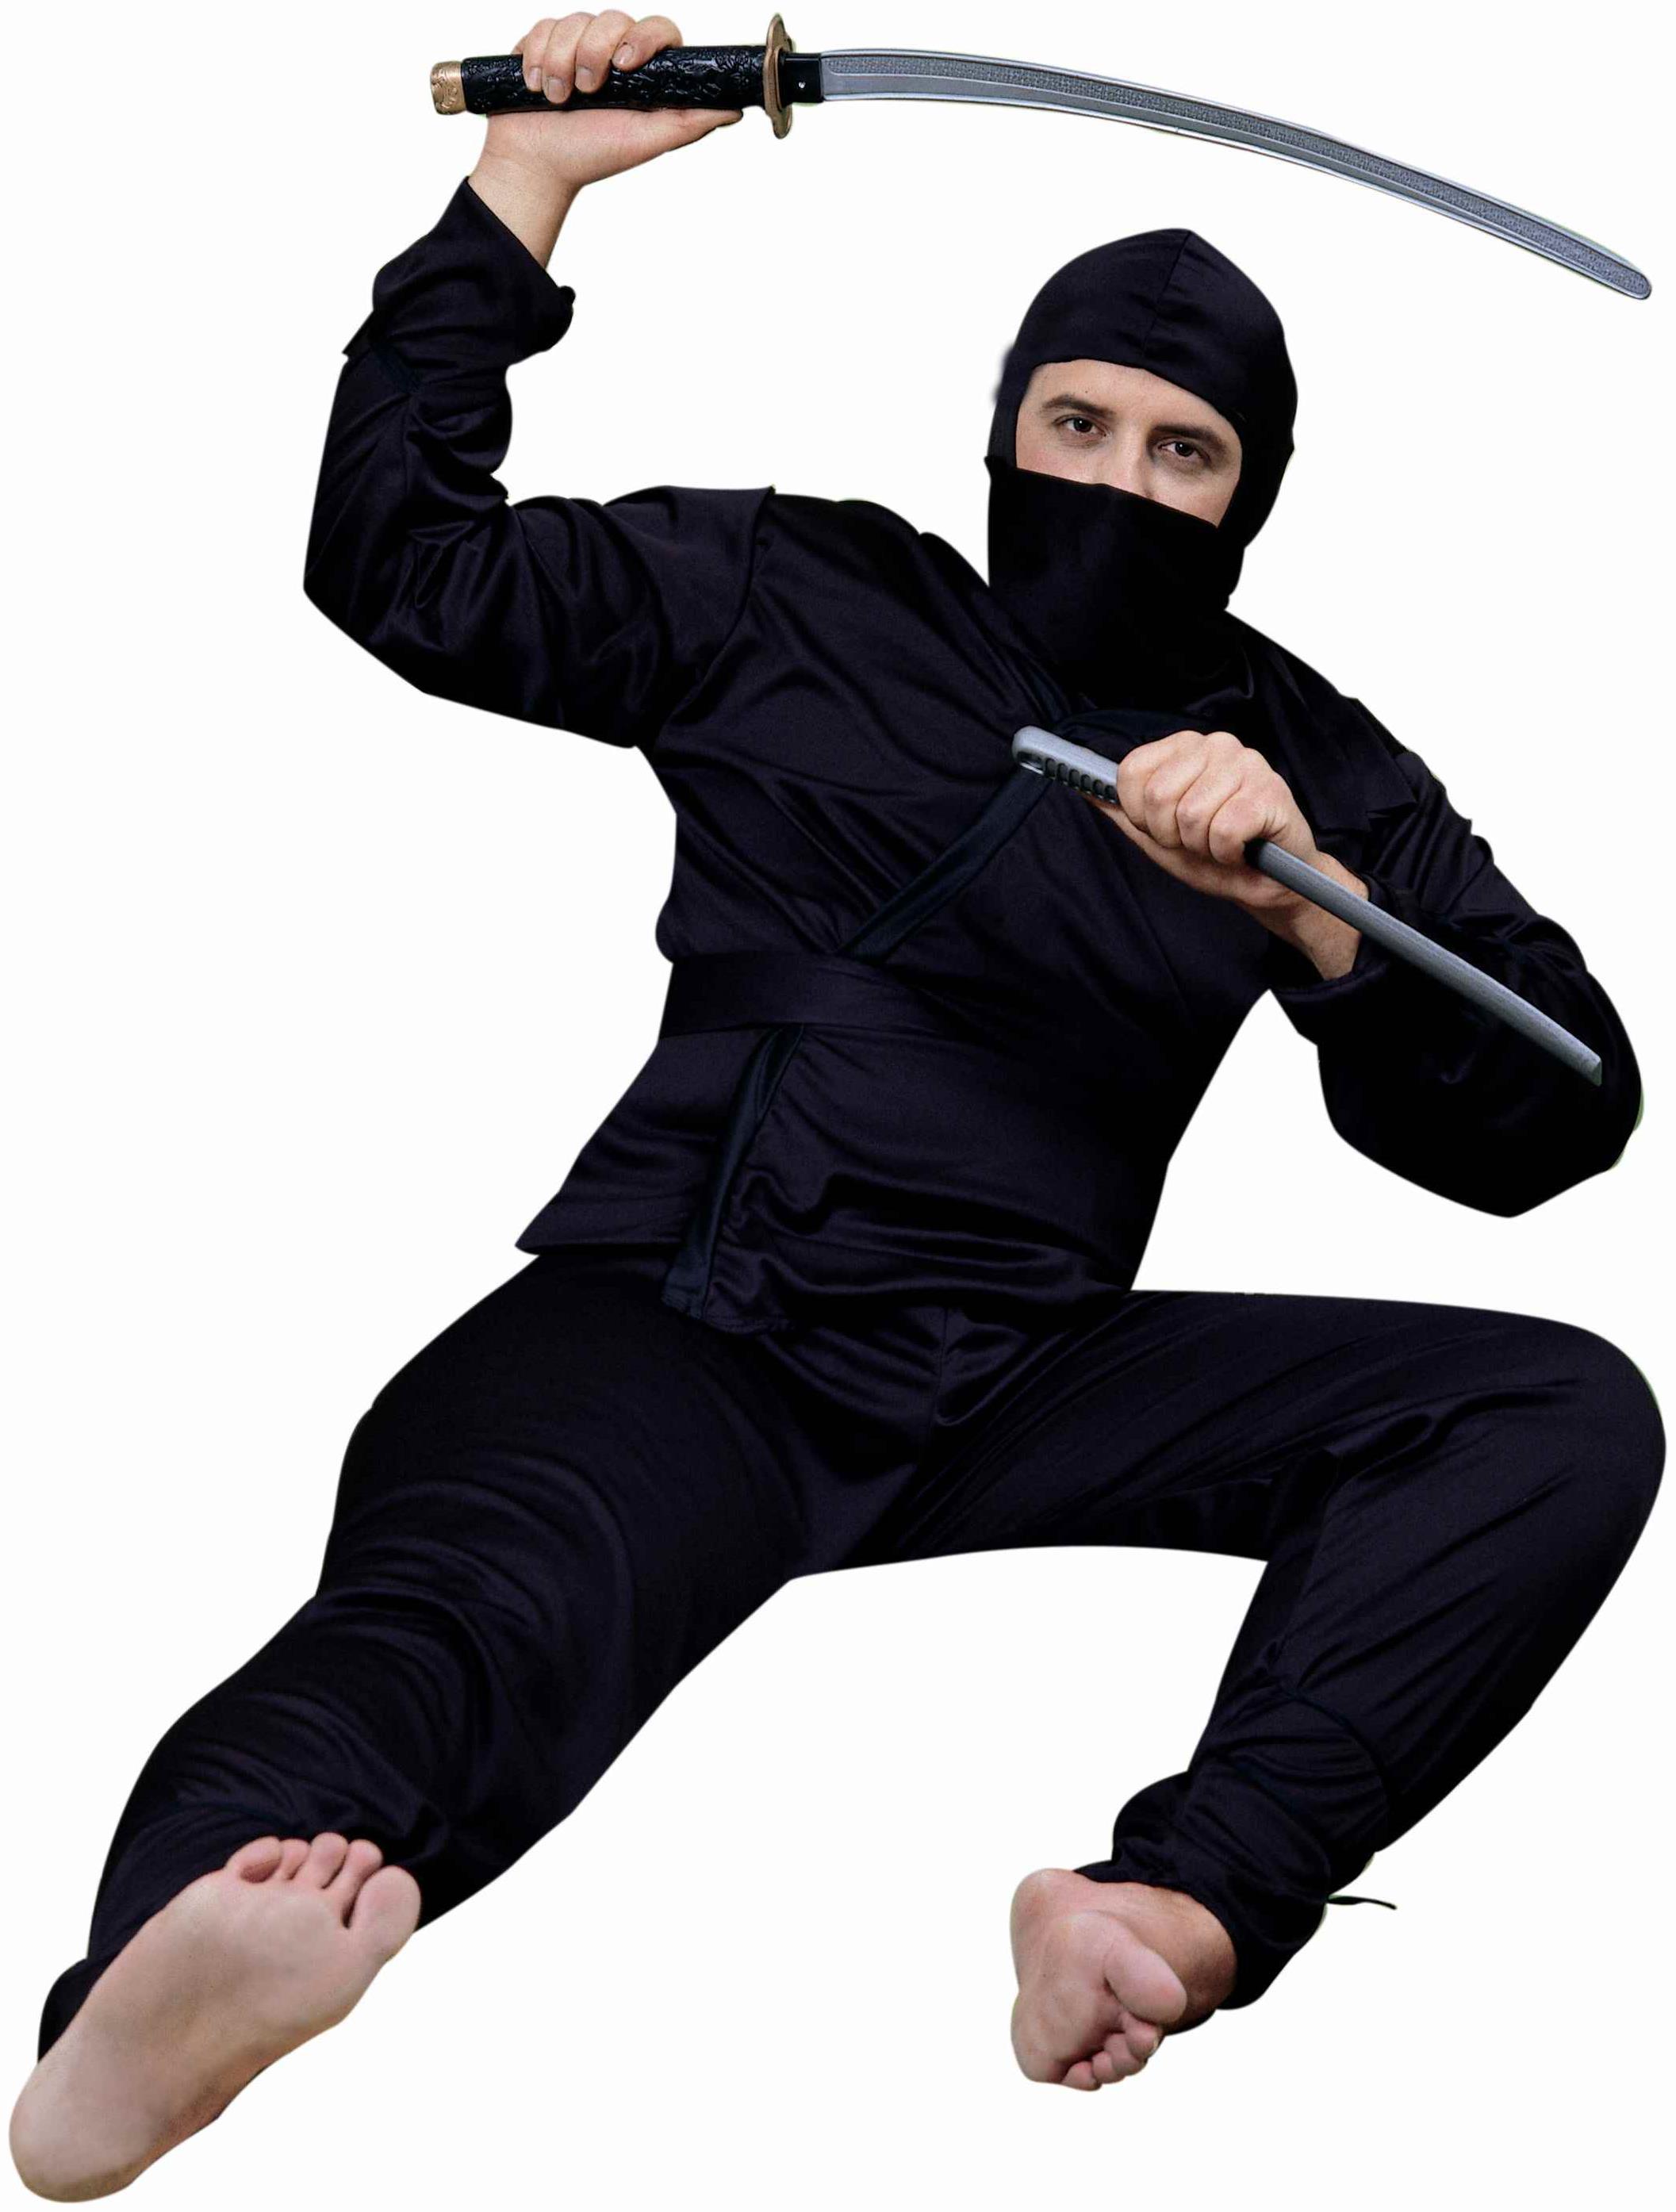 меня картинка серого ниндзя считается